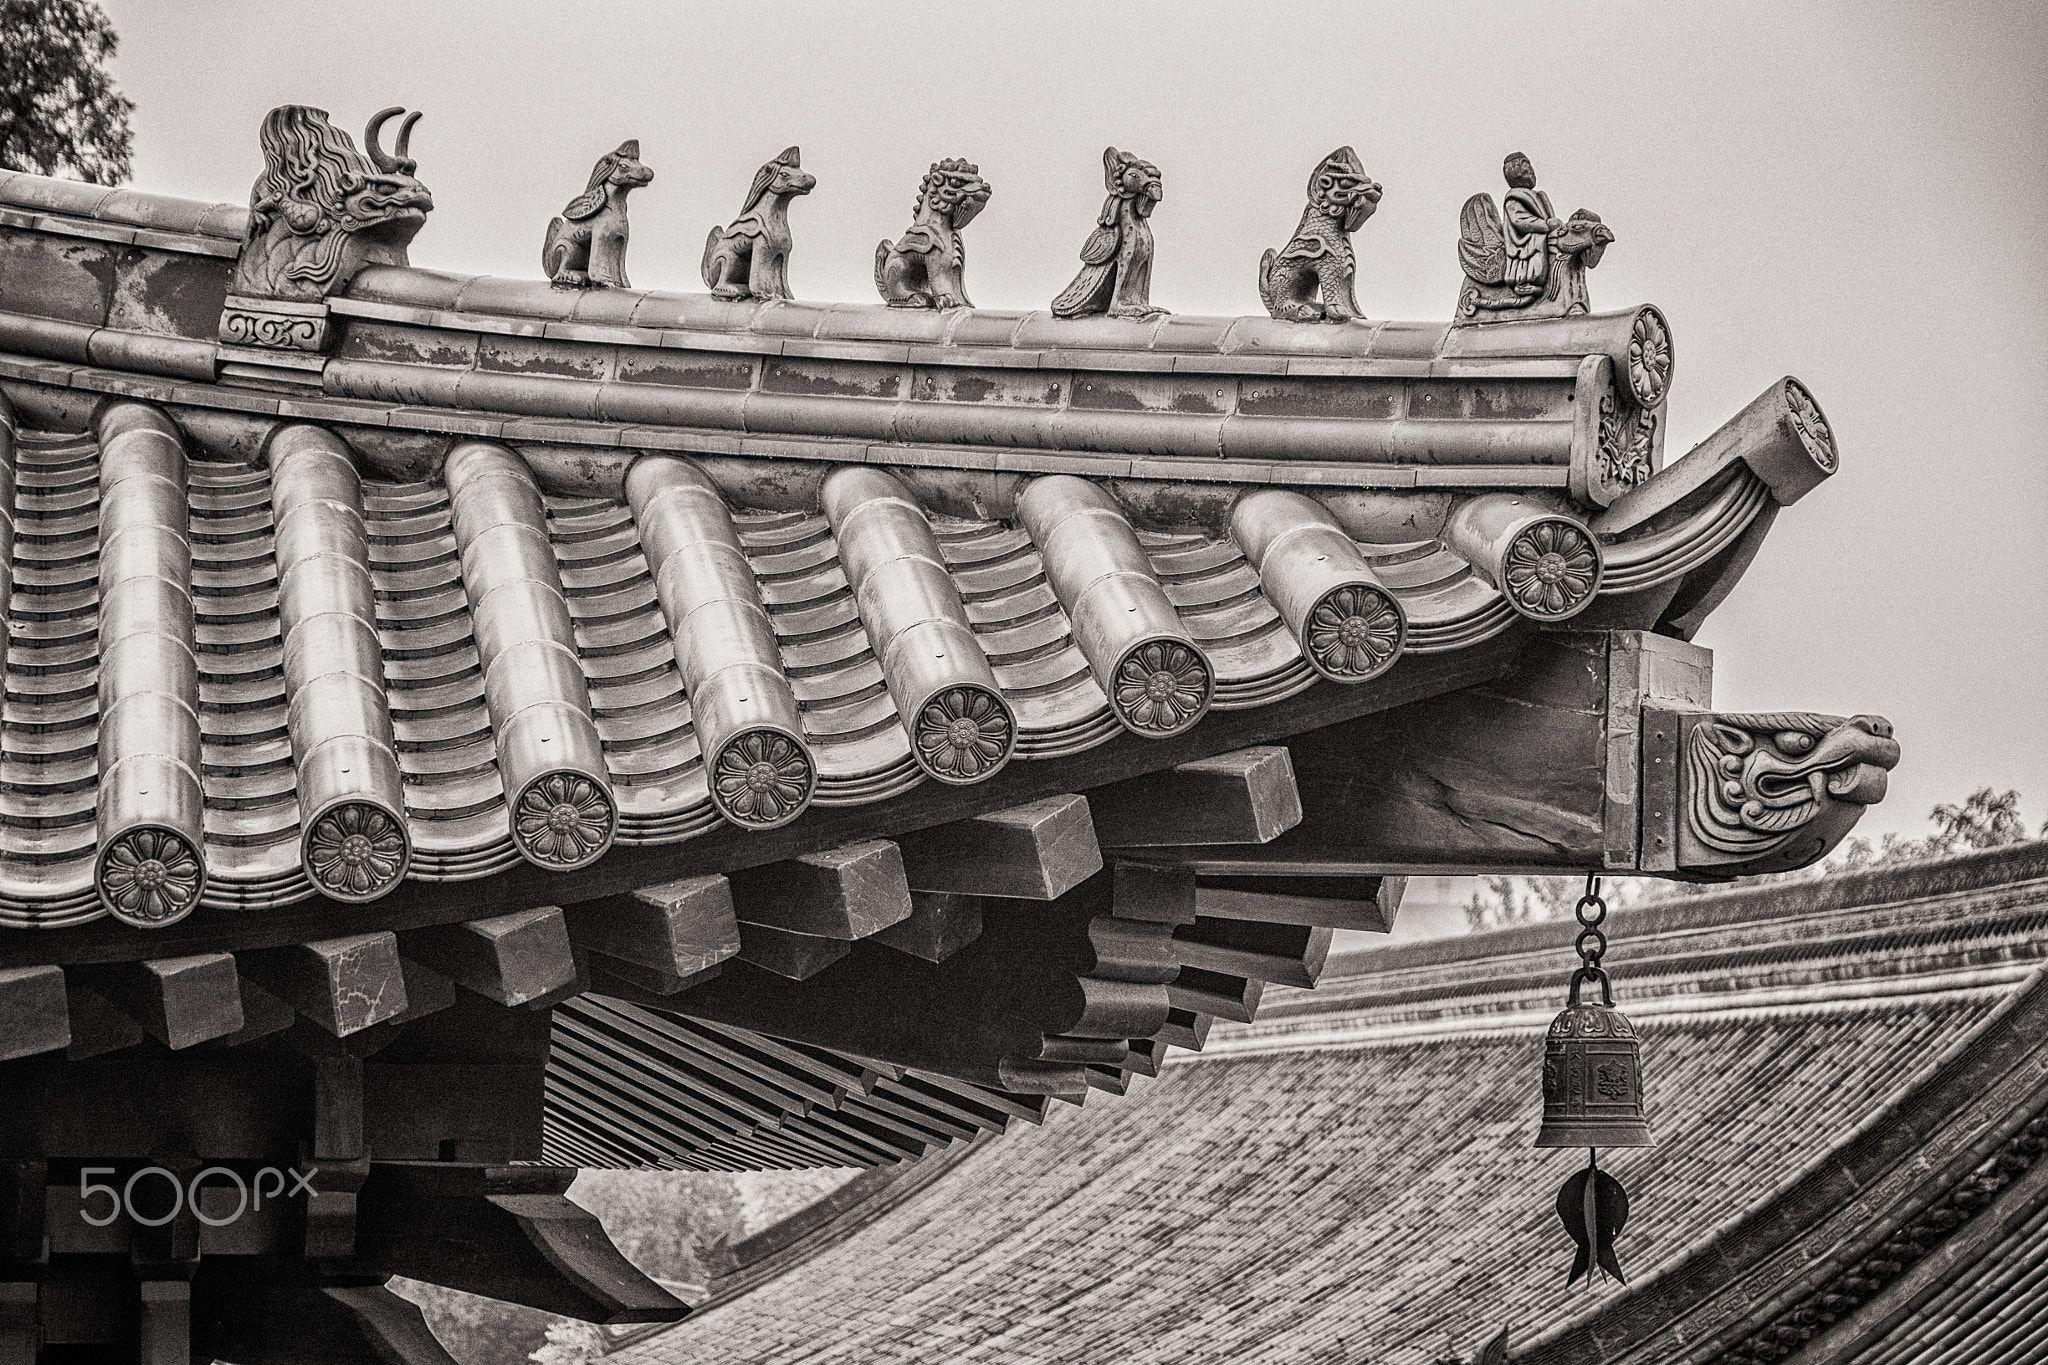 西安style_Xian 西安 - Xian 西安 | Chinese architecture, China art